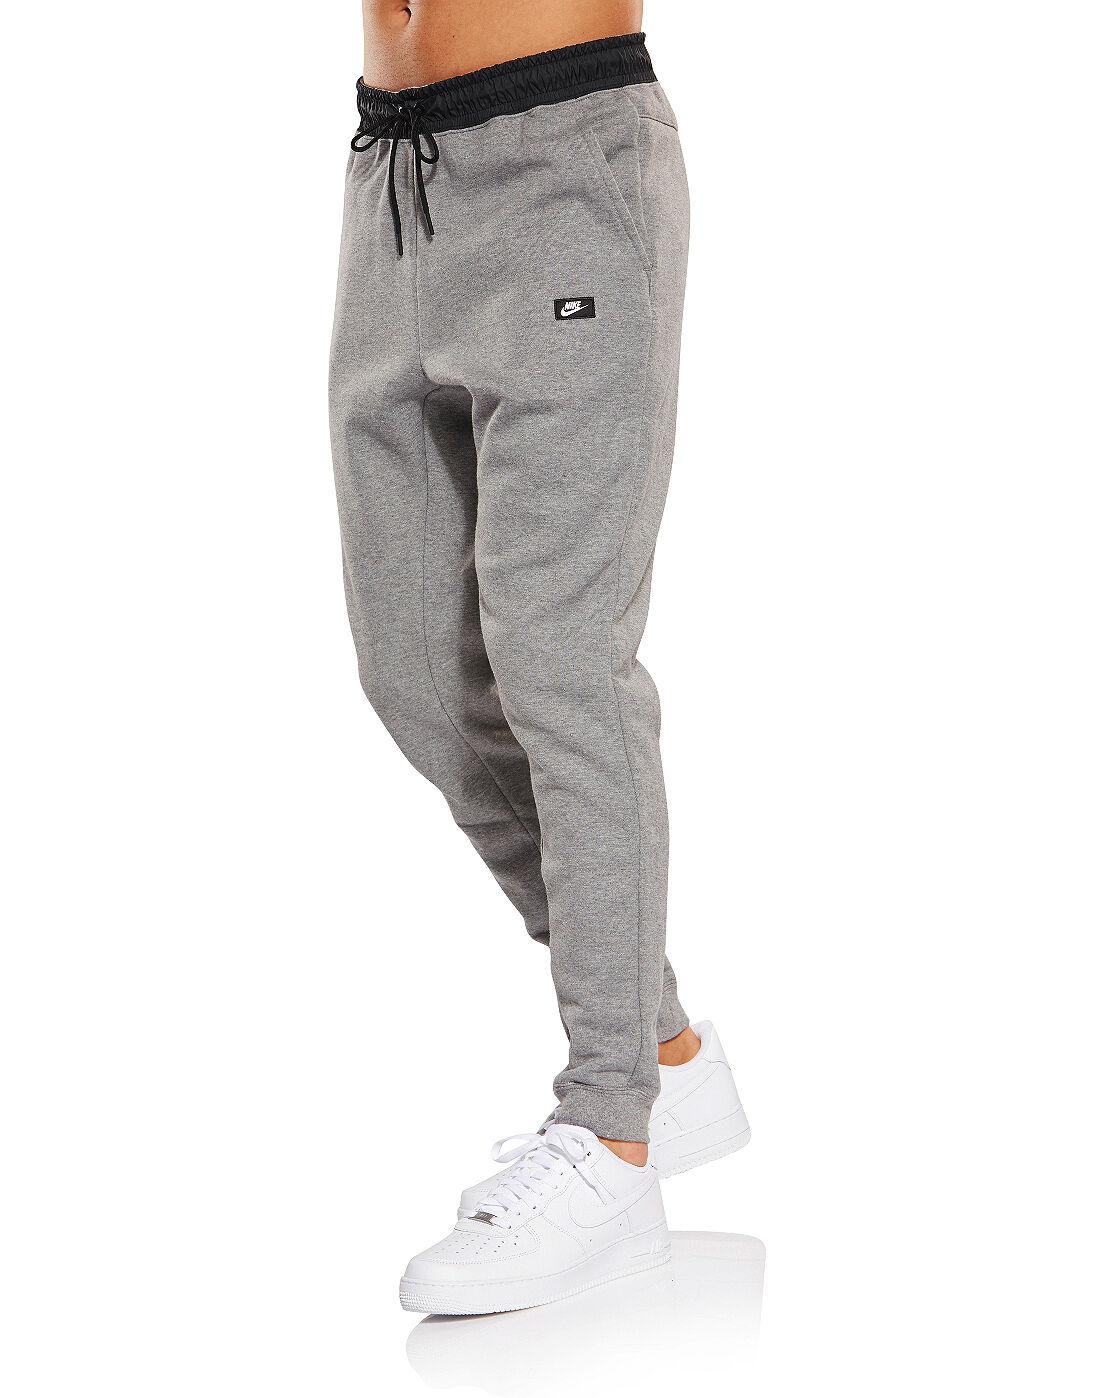 Men's Nike Modern Pants | Grey | Life